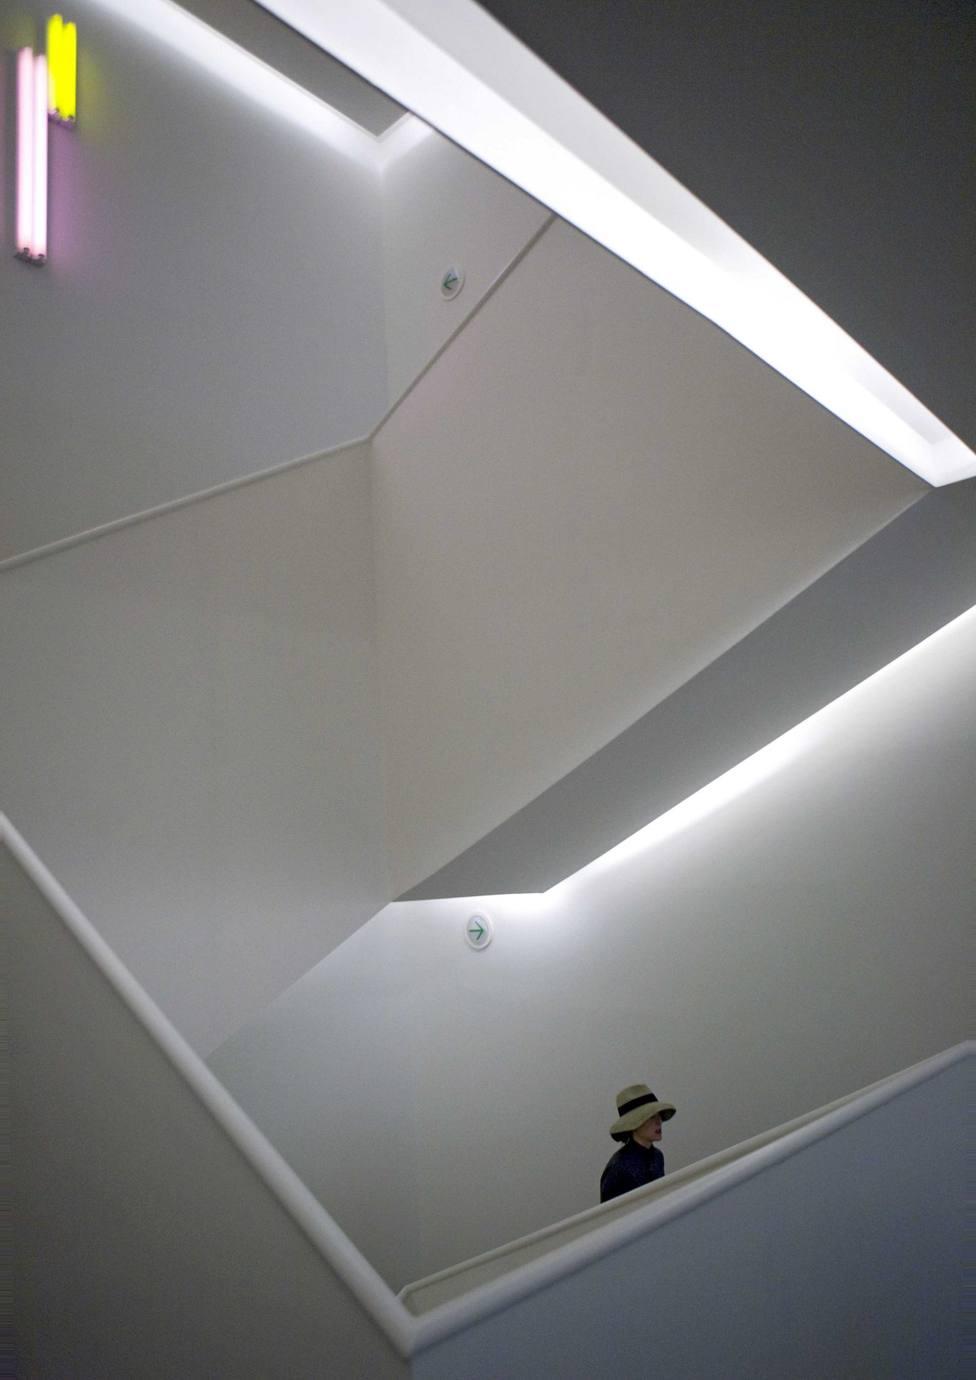 De Centro de Artes Visuales Helga de Alvear a Museo de Arte Contemporáneo Helga de Alvear